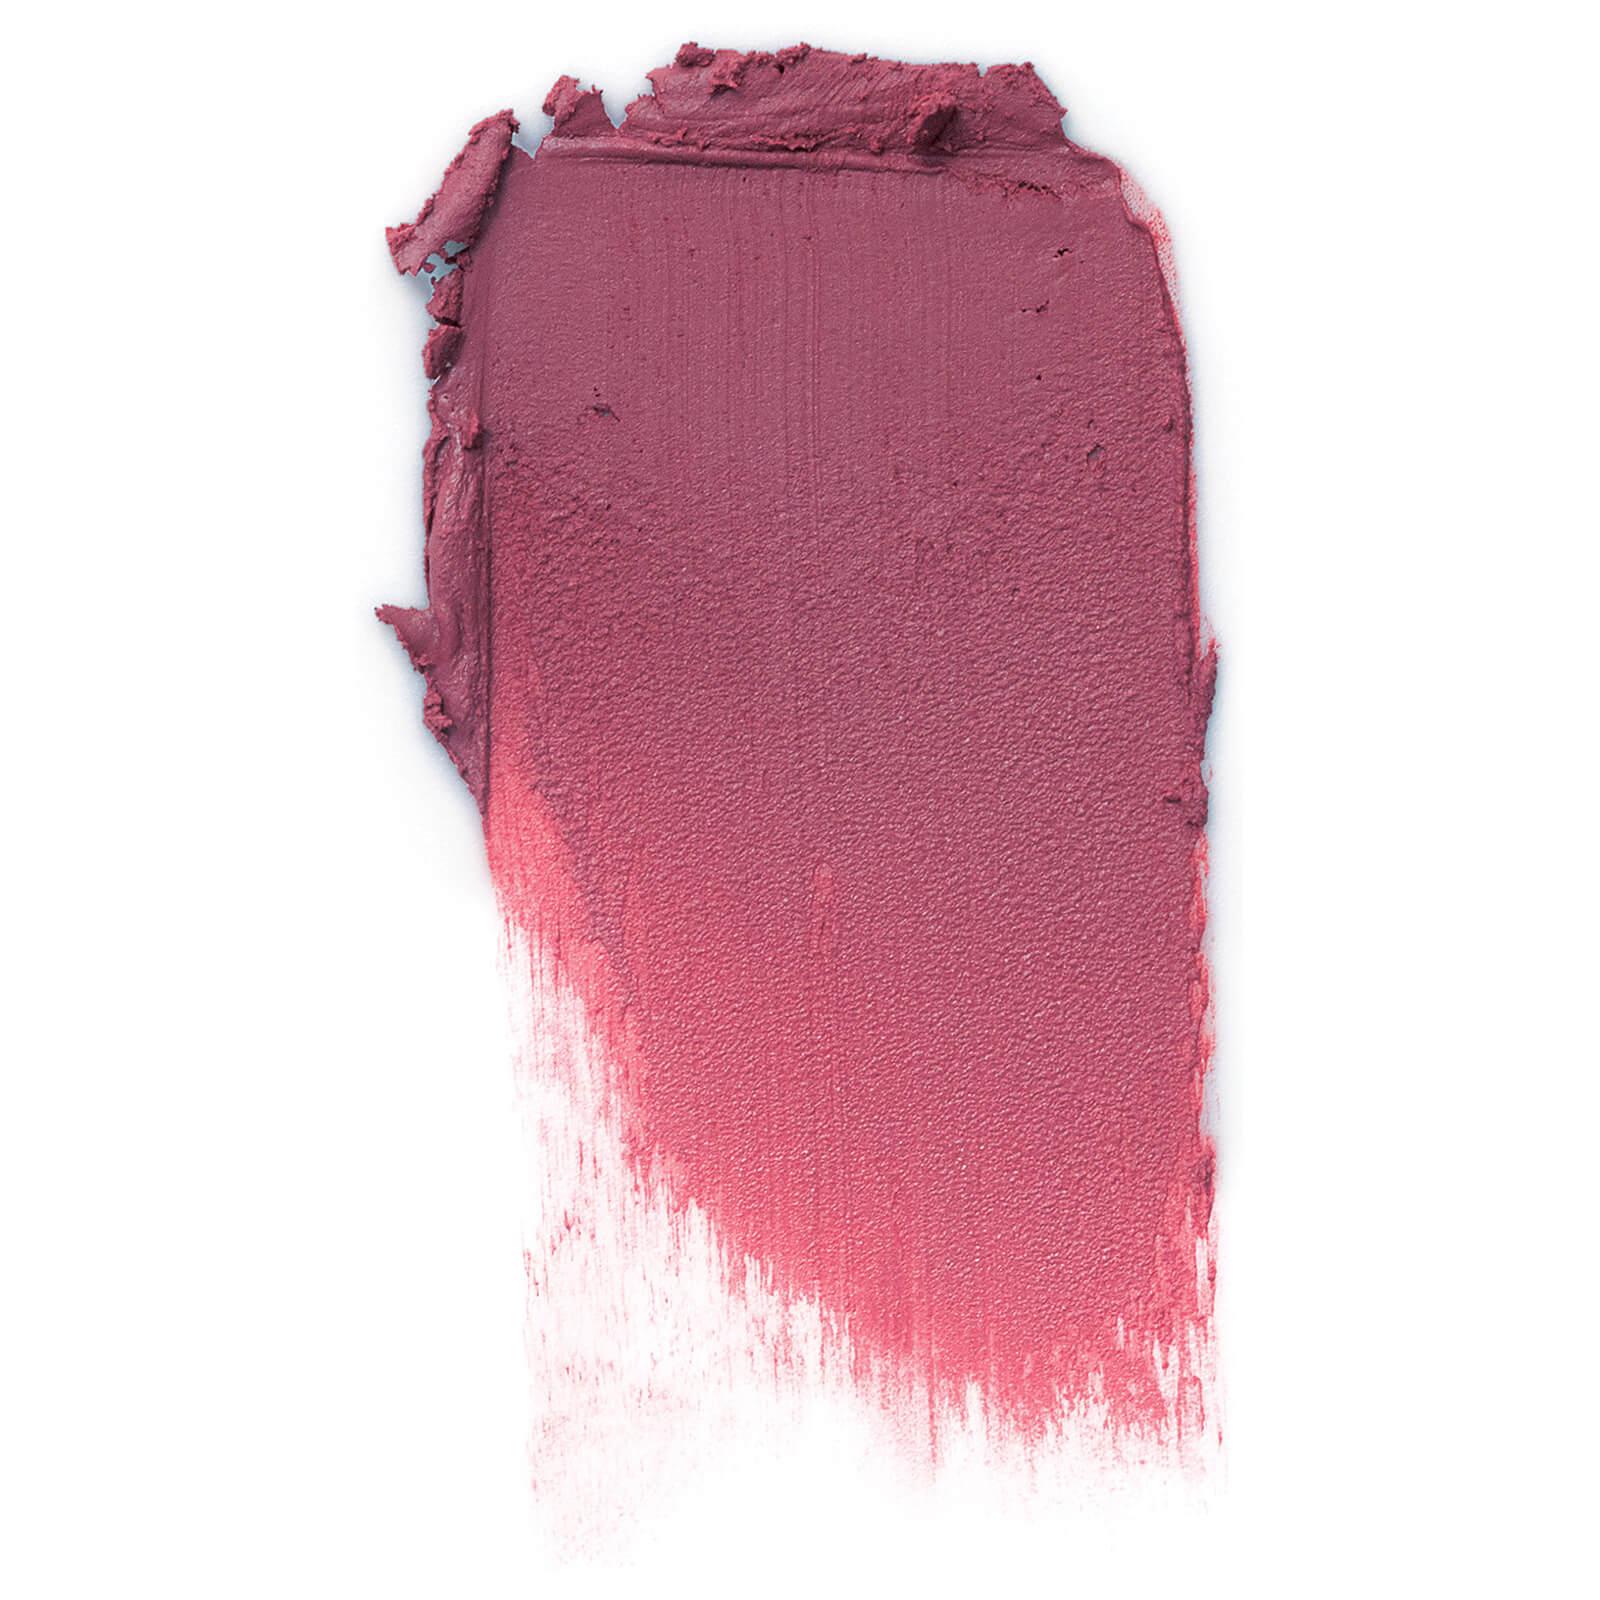 Bobbi Brown Luxe Matte Lip Colour (Various Shades) - Crown Jewel